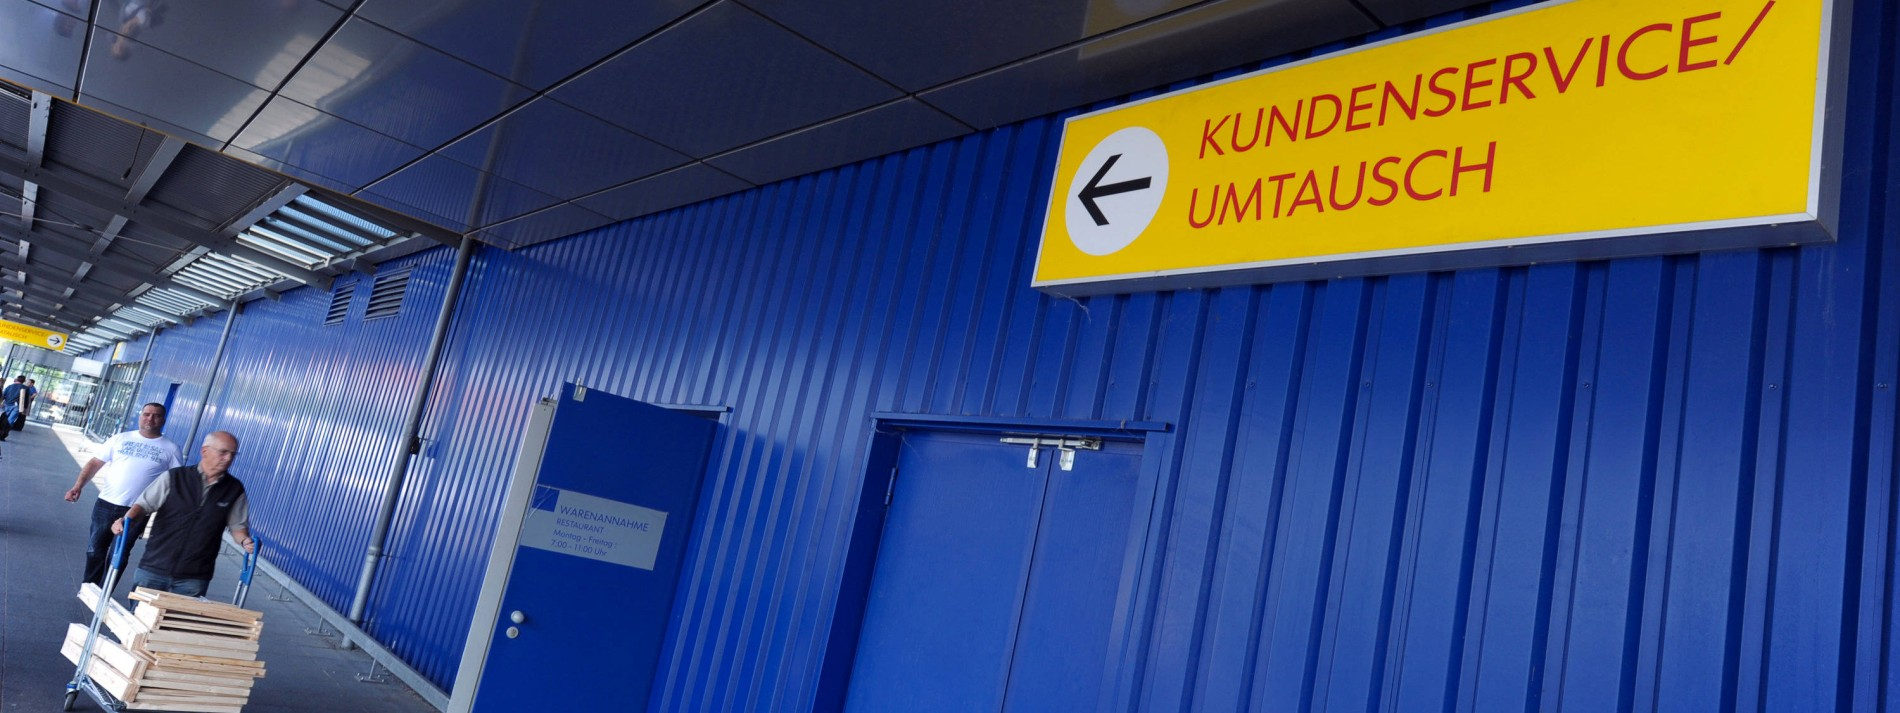 Ikea Bei Startet Rückruf Wegen Stromschlaggefahr Lampenfuß hrsdtQCx